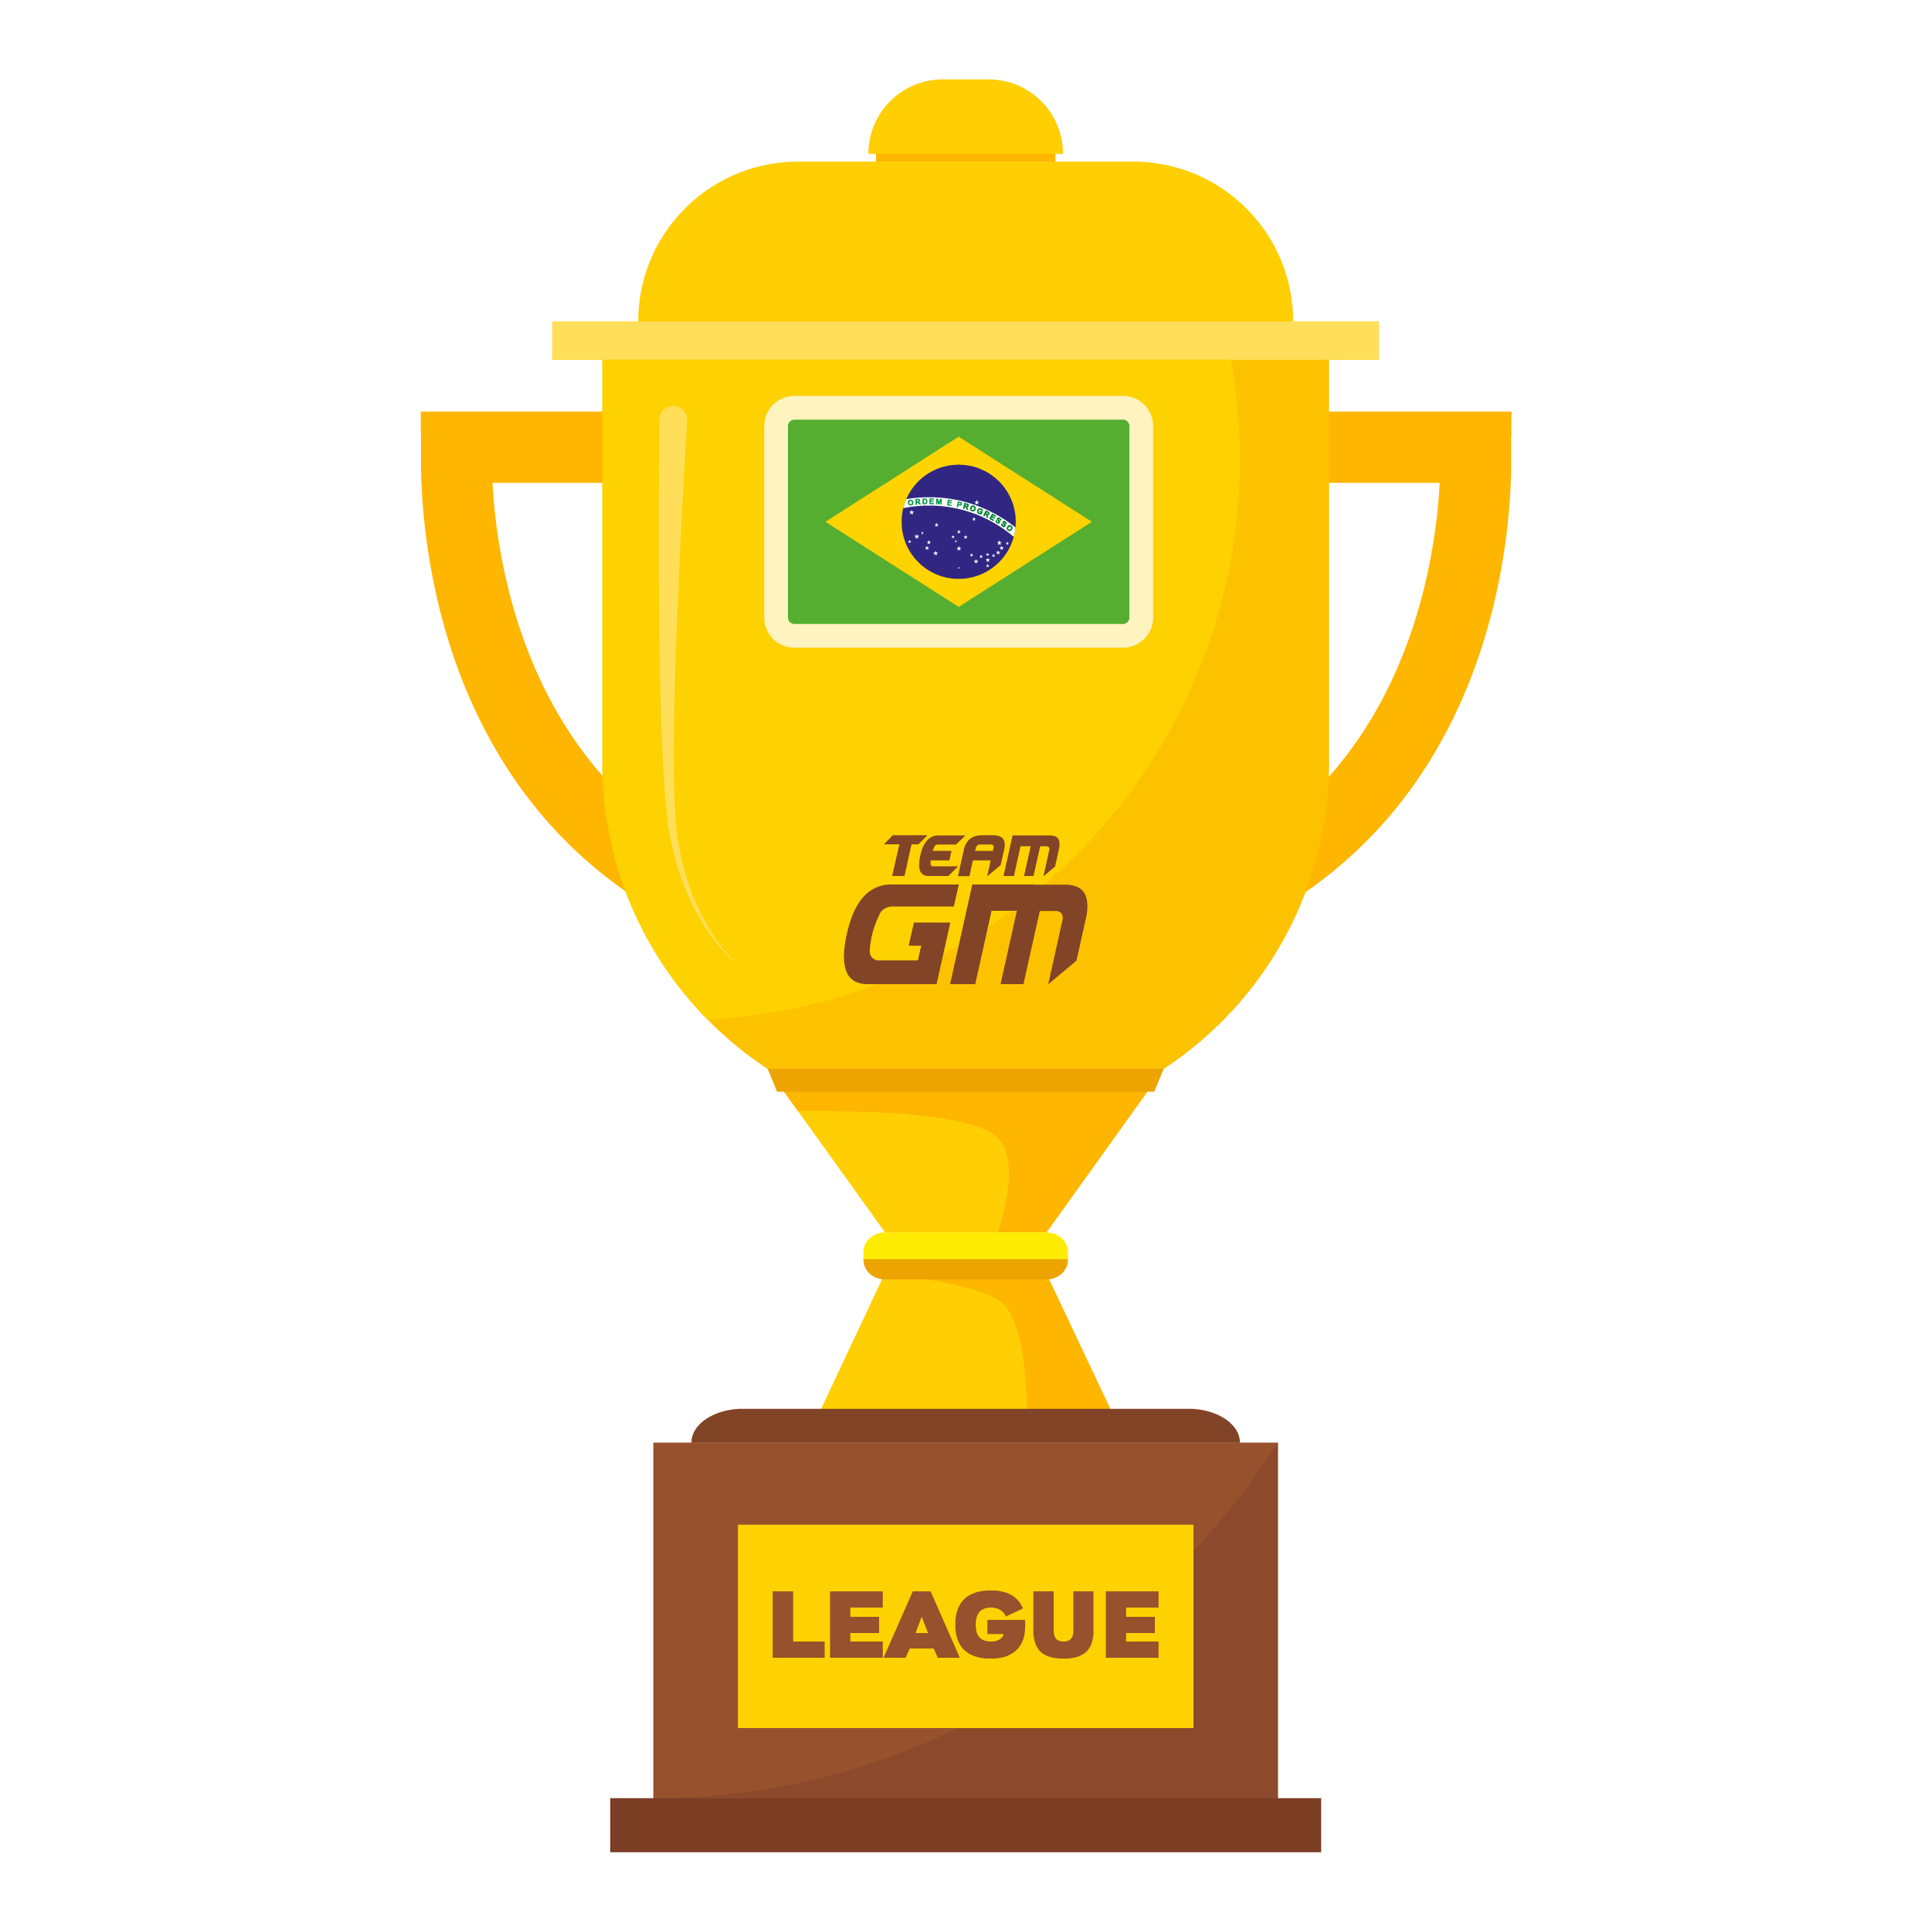 2ND - BRAZILIAN SUPER LEAGUE (B SERIE)